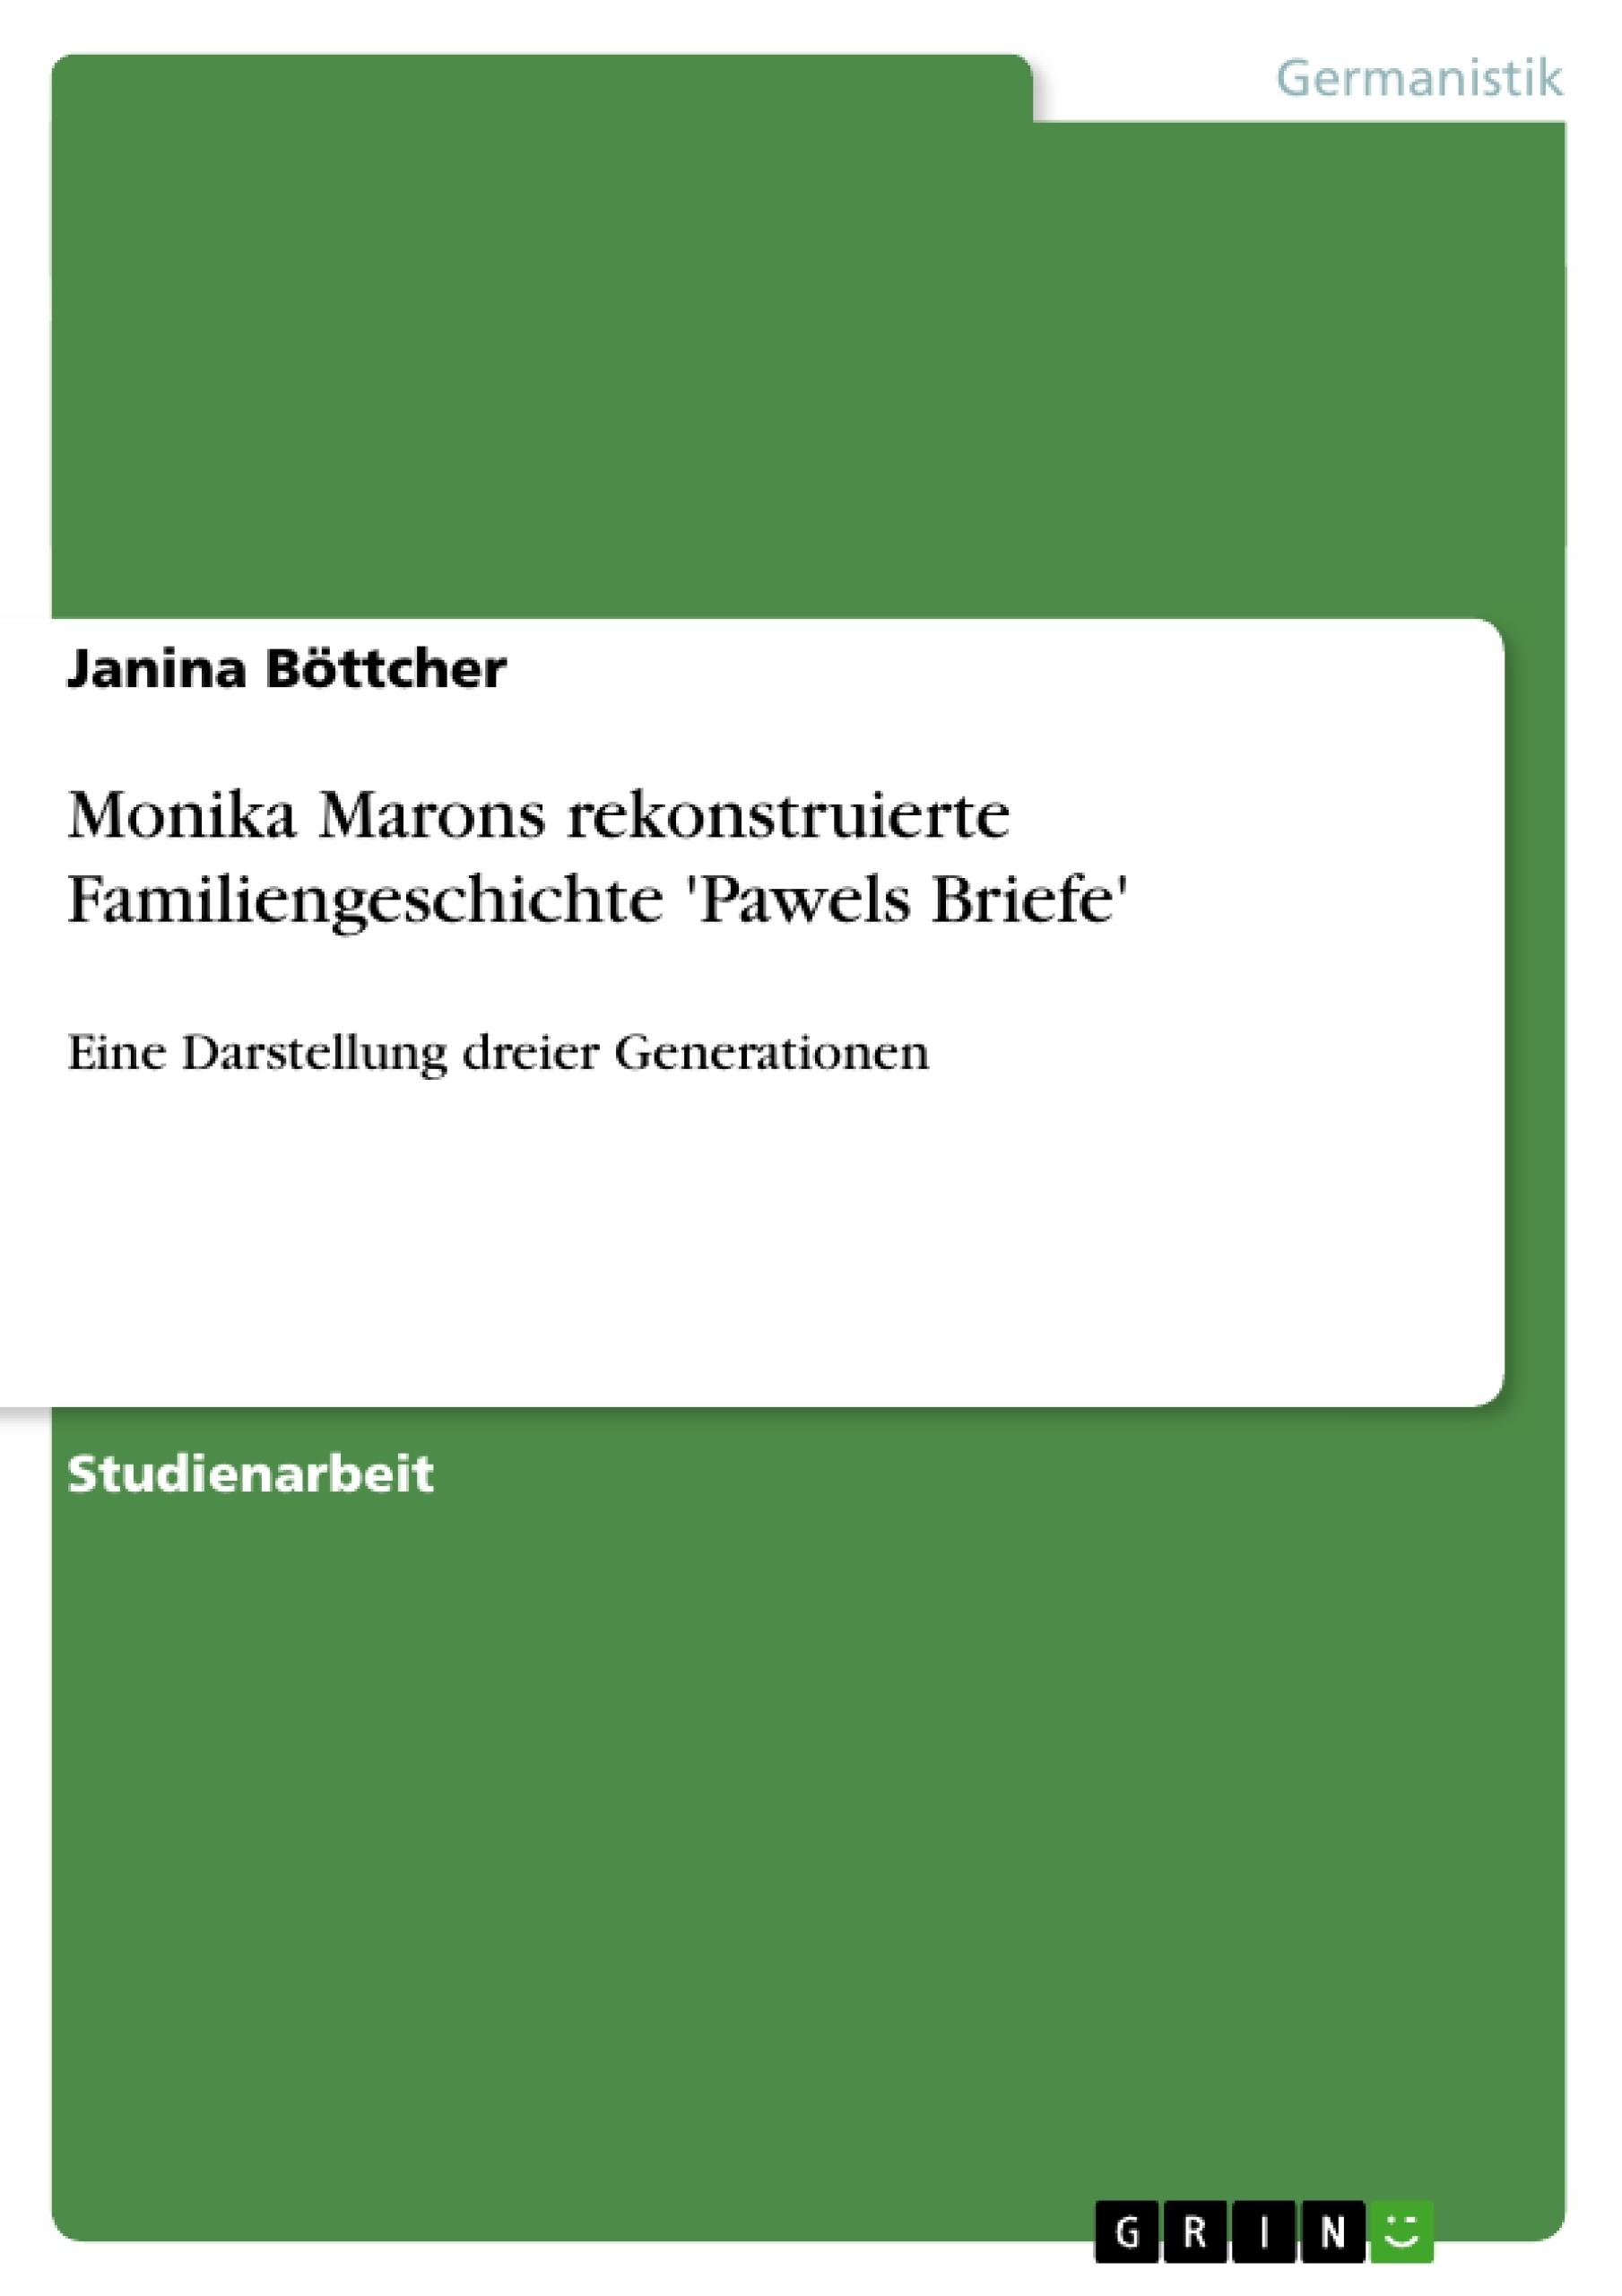 Titel: Monika Marons rekonstruierte Familiengeschichte 'Pawels Briefe'